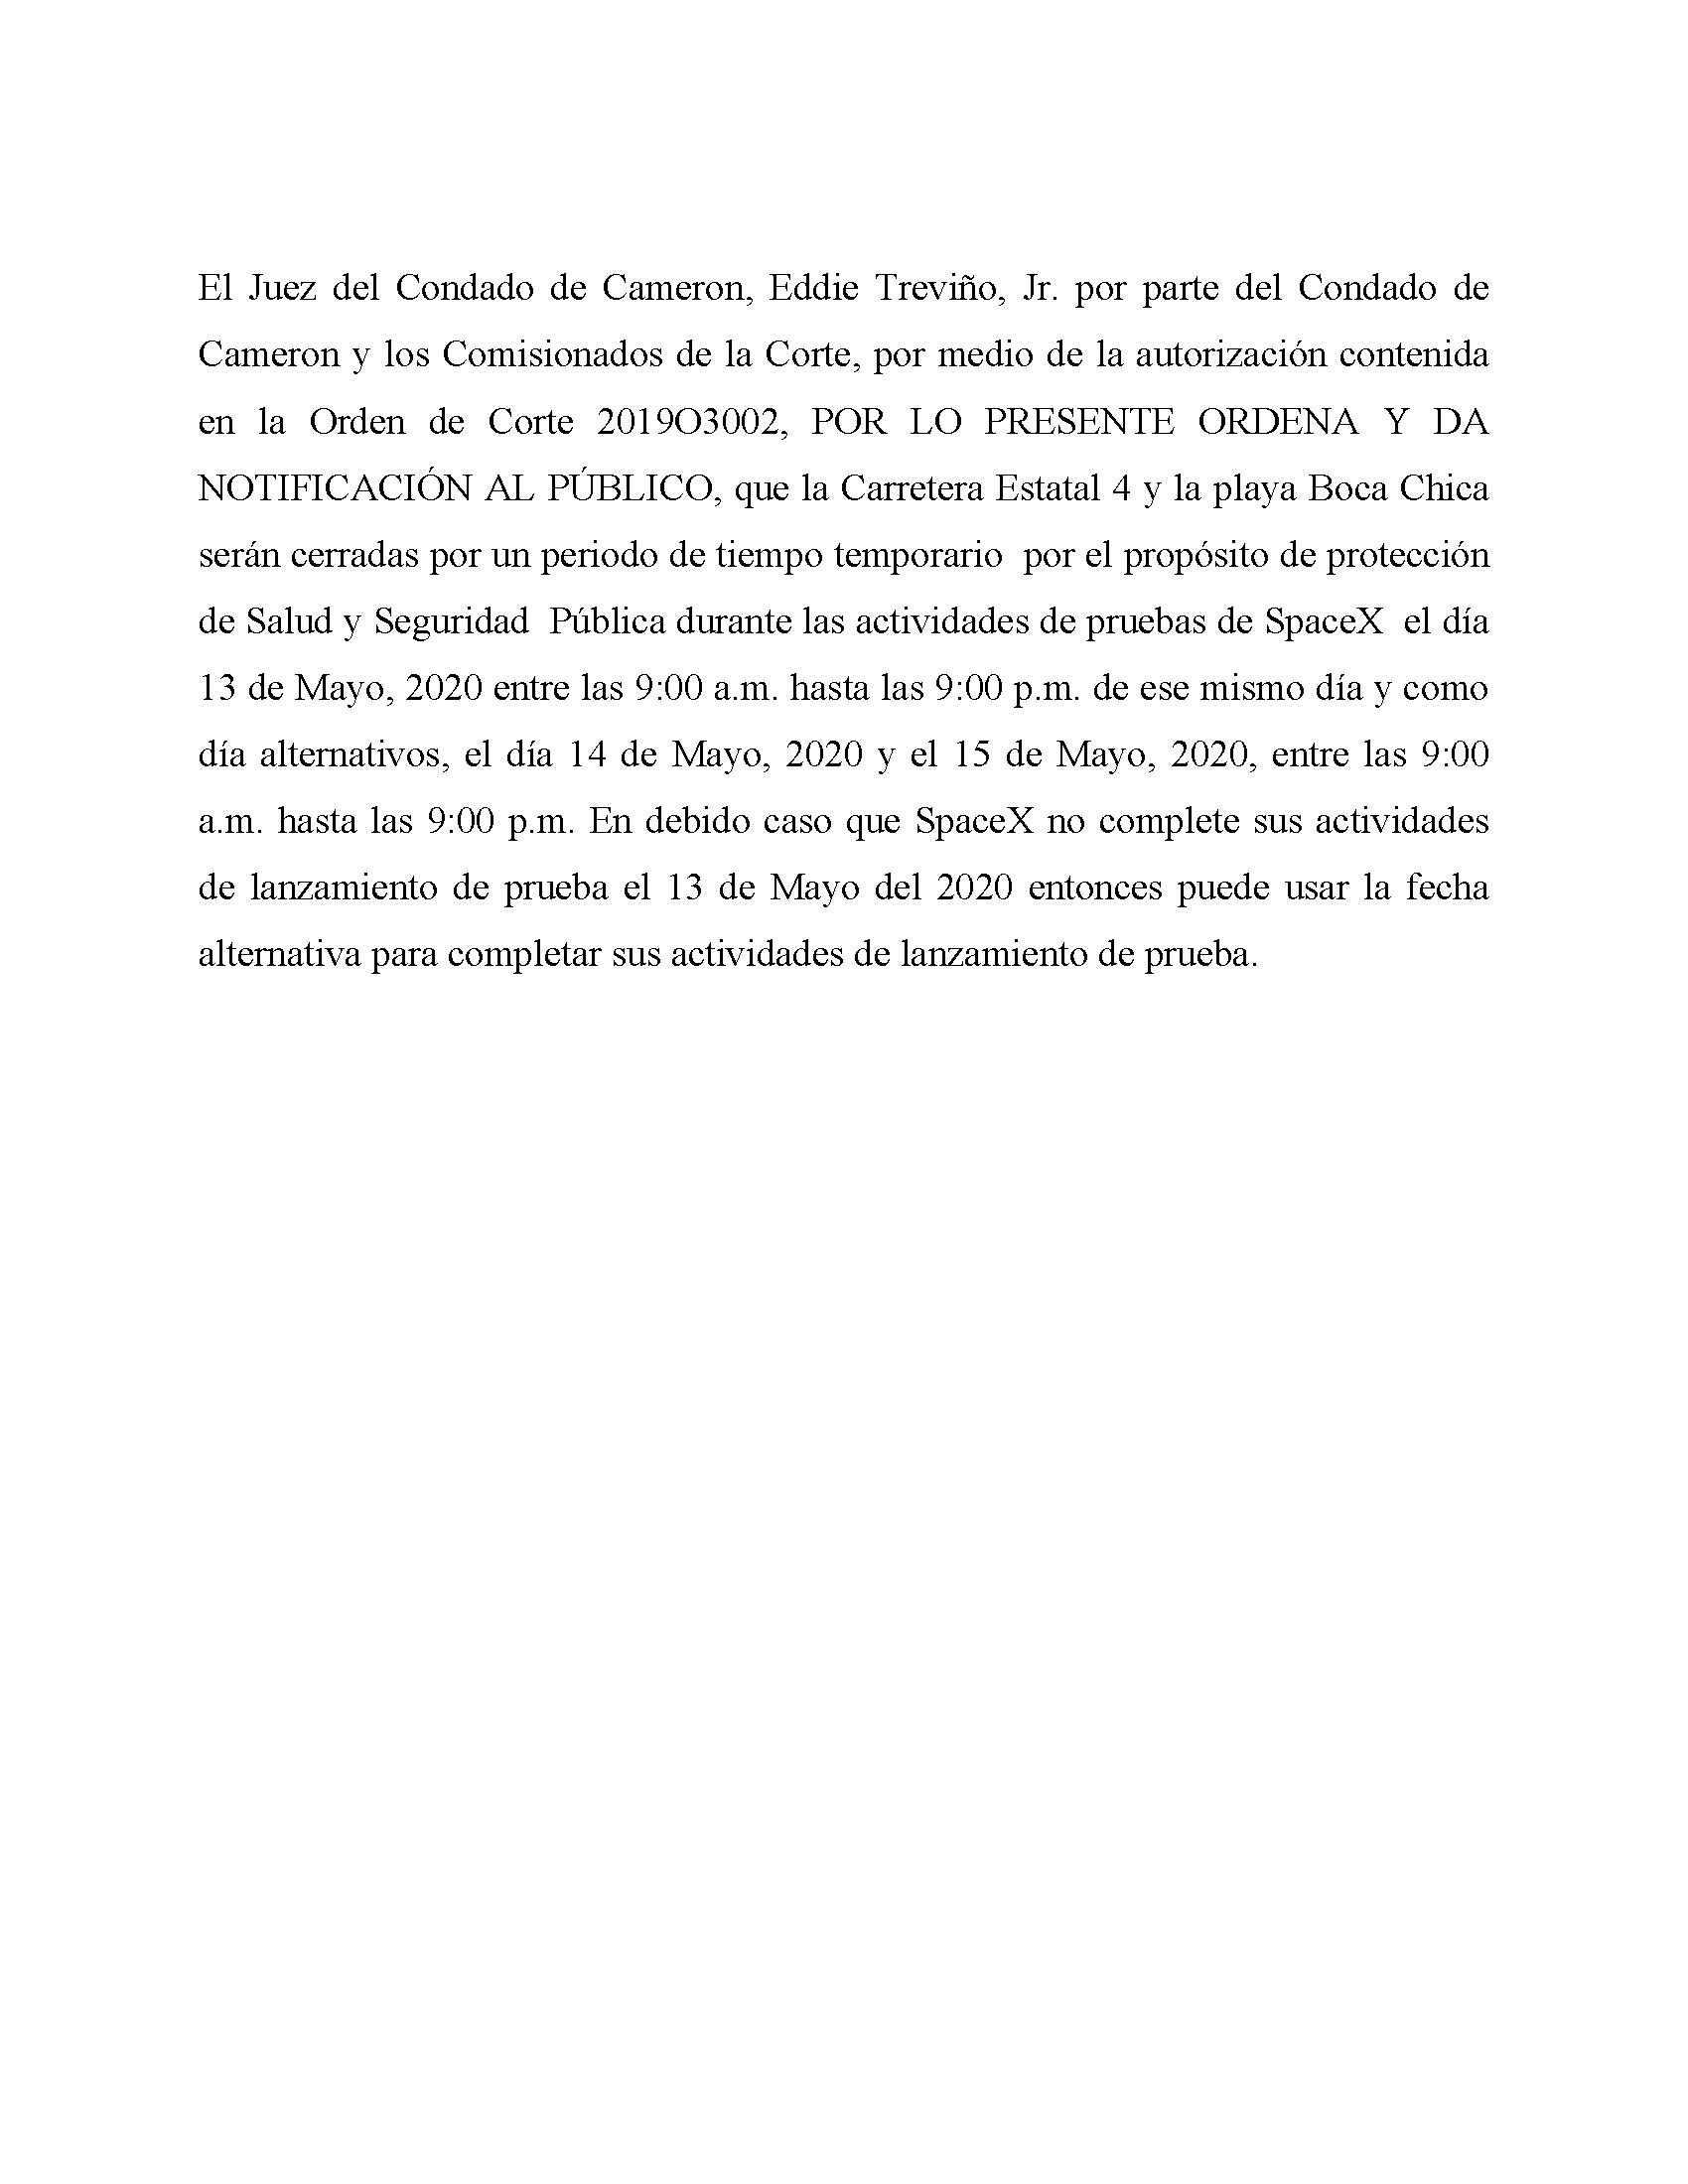 ORDER.CLOSURE OF HIGHWAY 4 Y LA PLAYA BOCA CHICA.SPANISH.05.13.20